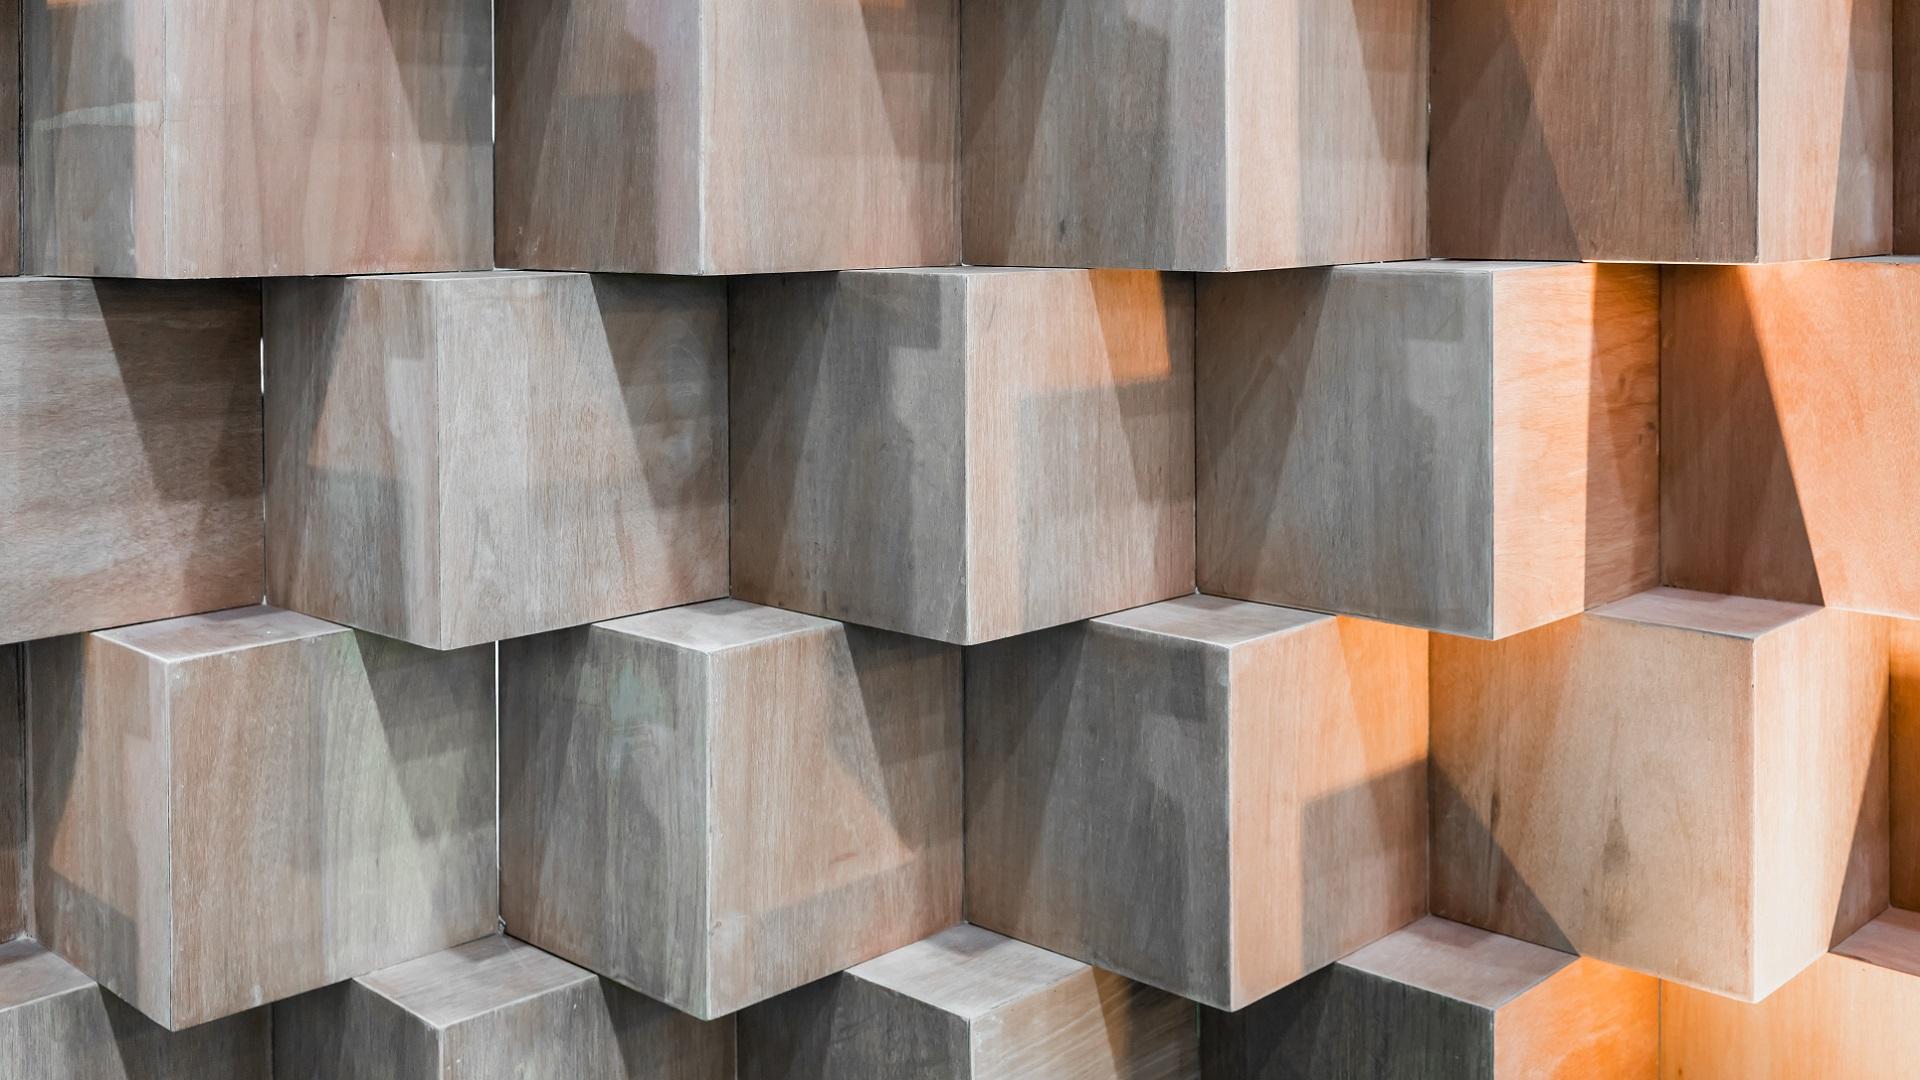 Symmetrical wooden blocks